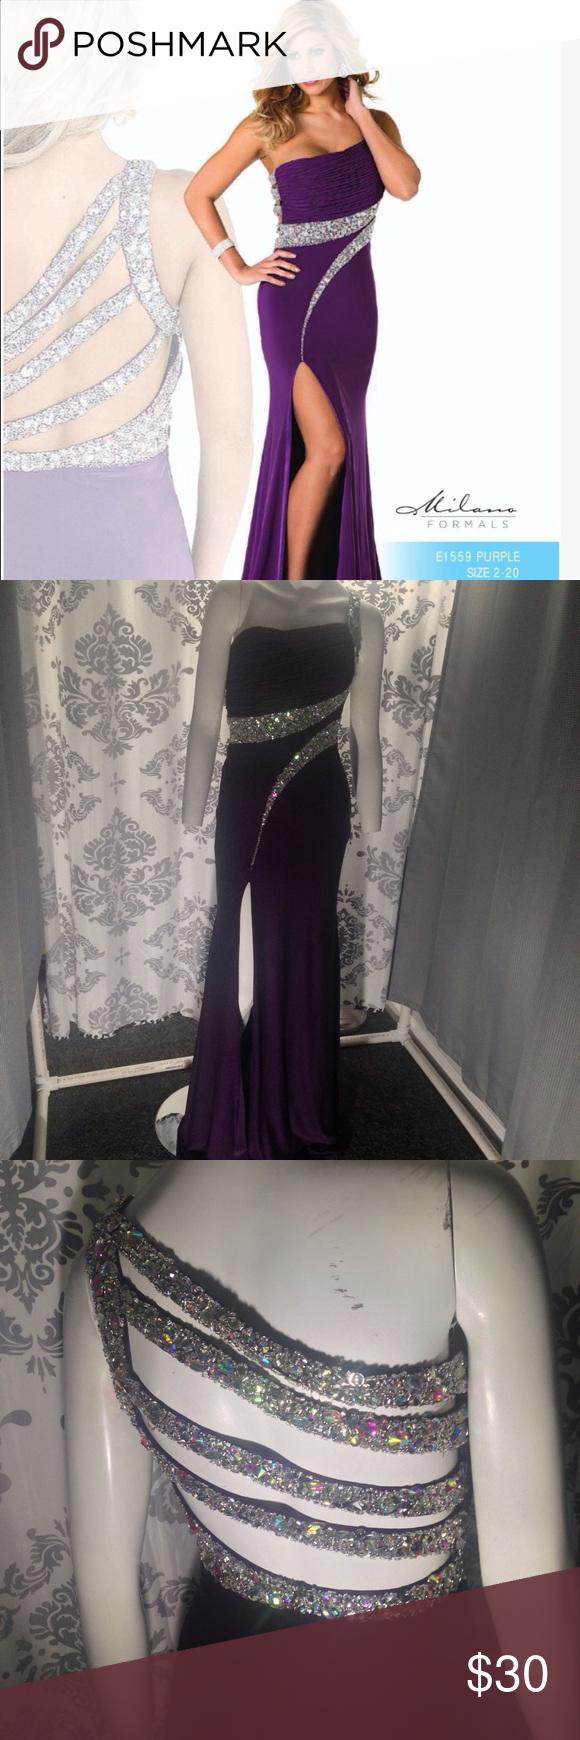 Purplr Milano Prom Dresses